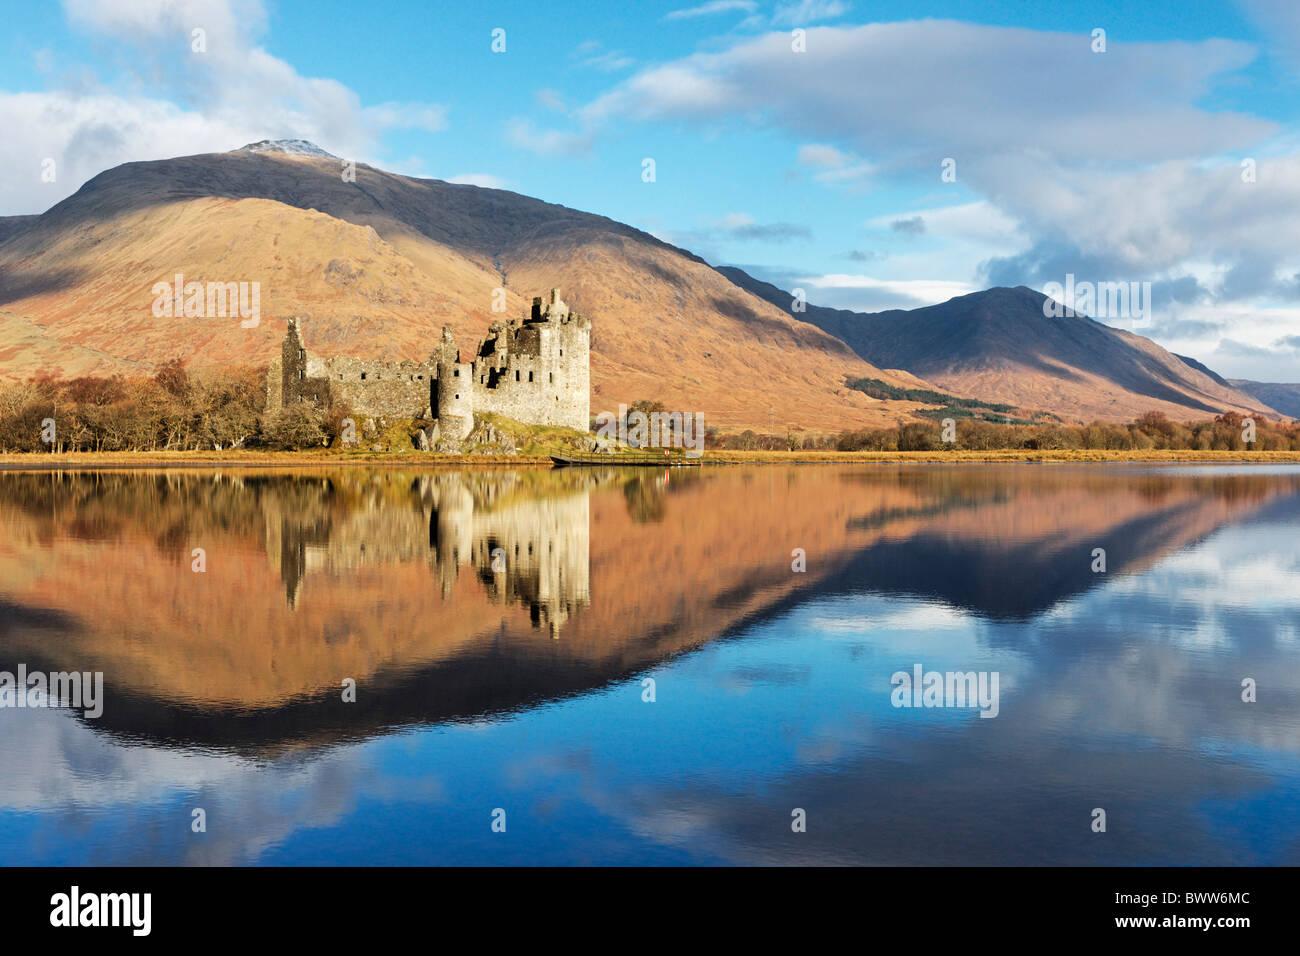 Kilchurn Castle reflected in Loch Awe, near Dalmally, Argyll and Bute, Scotland, UK. - Stock Image